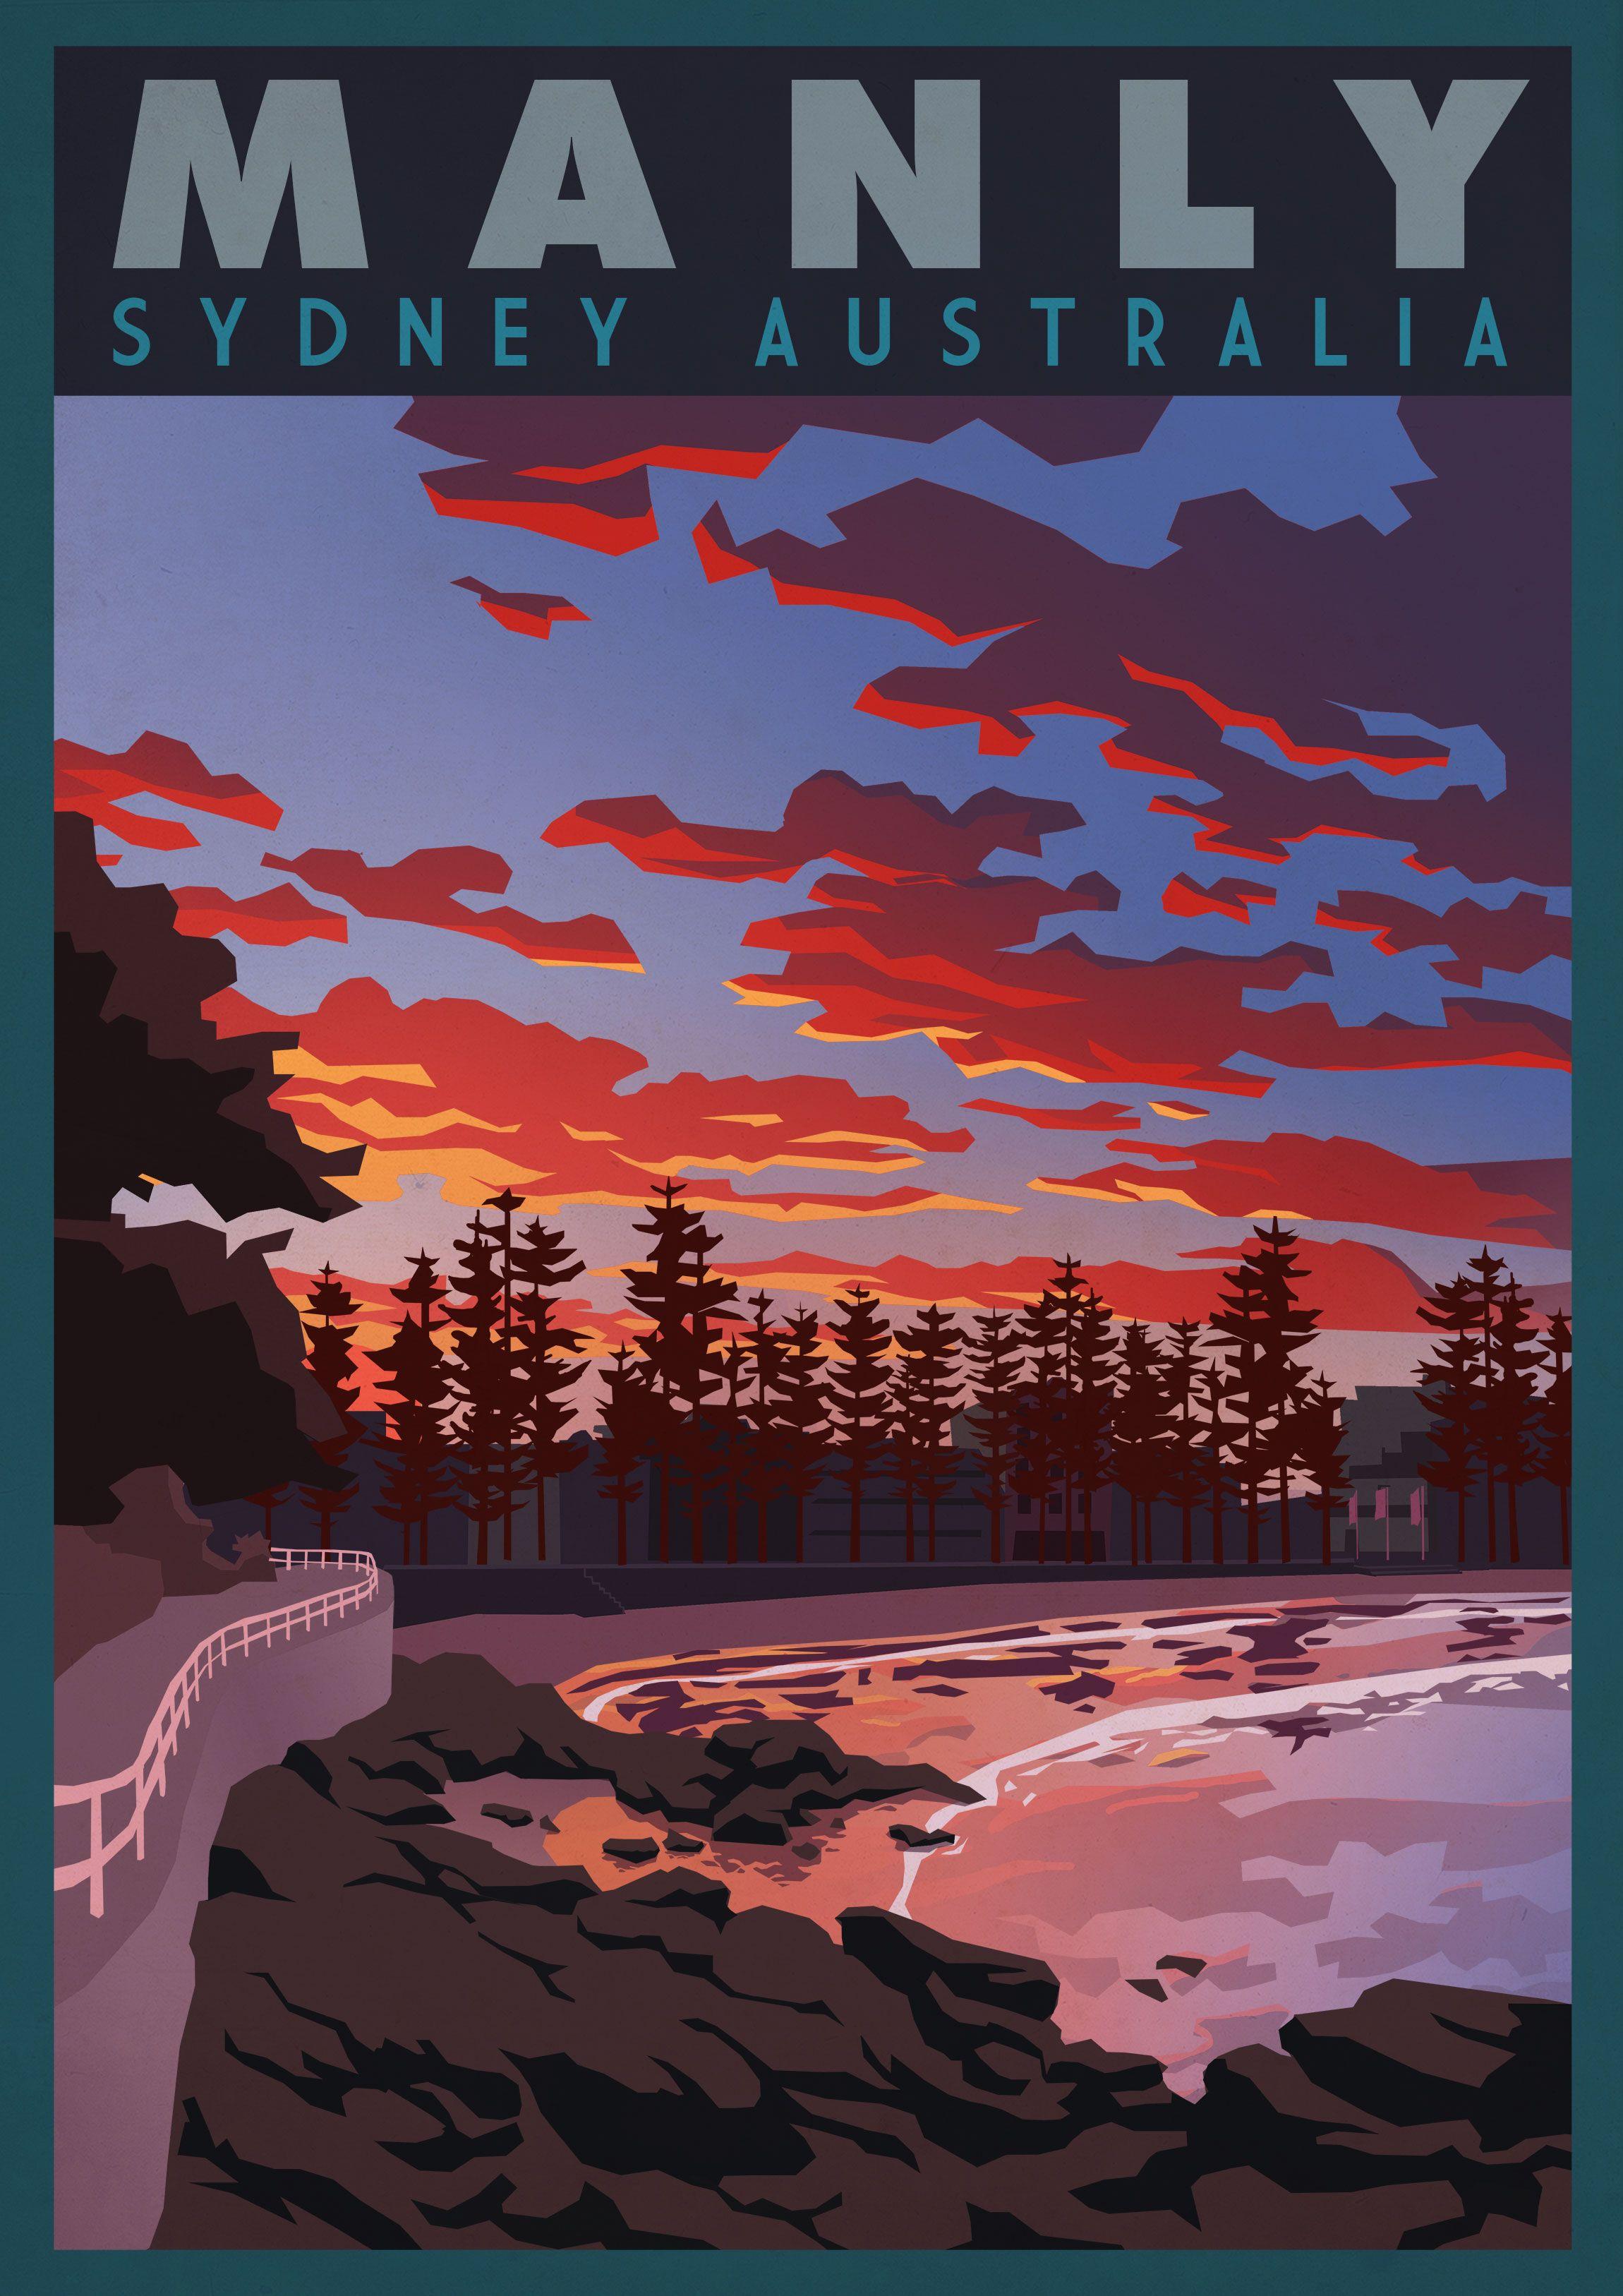 Jlcom Illo Manly Jpg 2300 3253 Vintage Travel Posters Retro Travel Poster Posters Australia